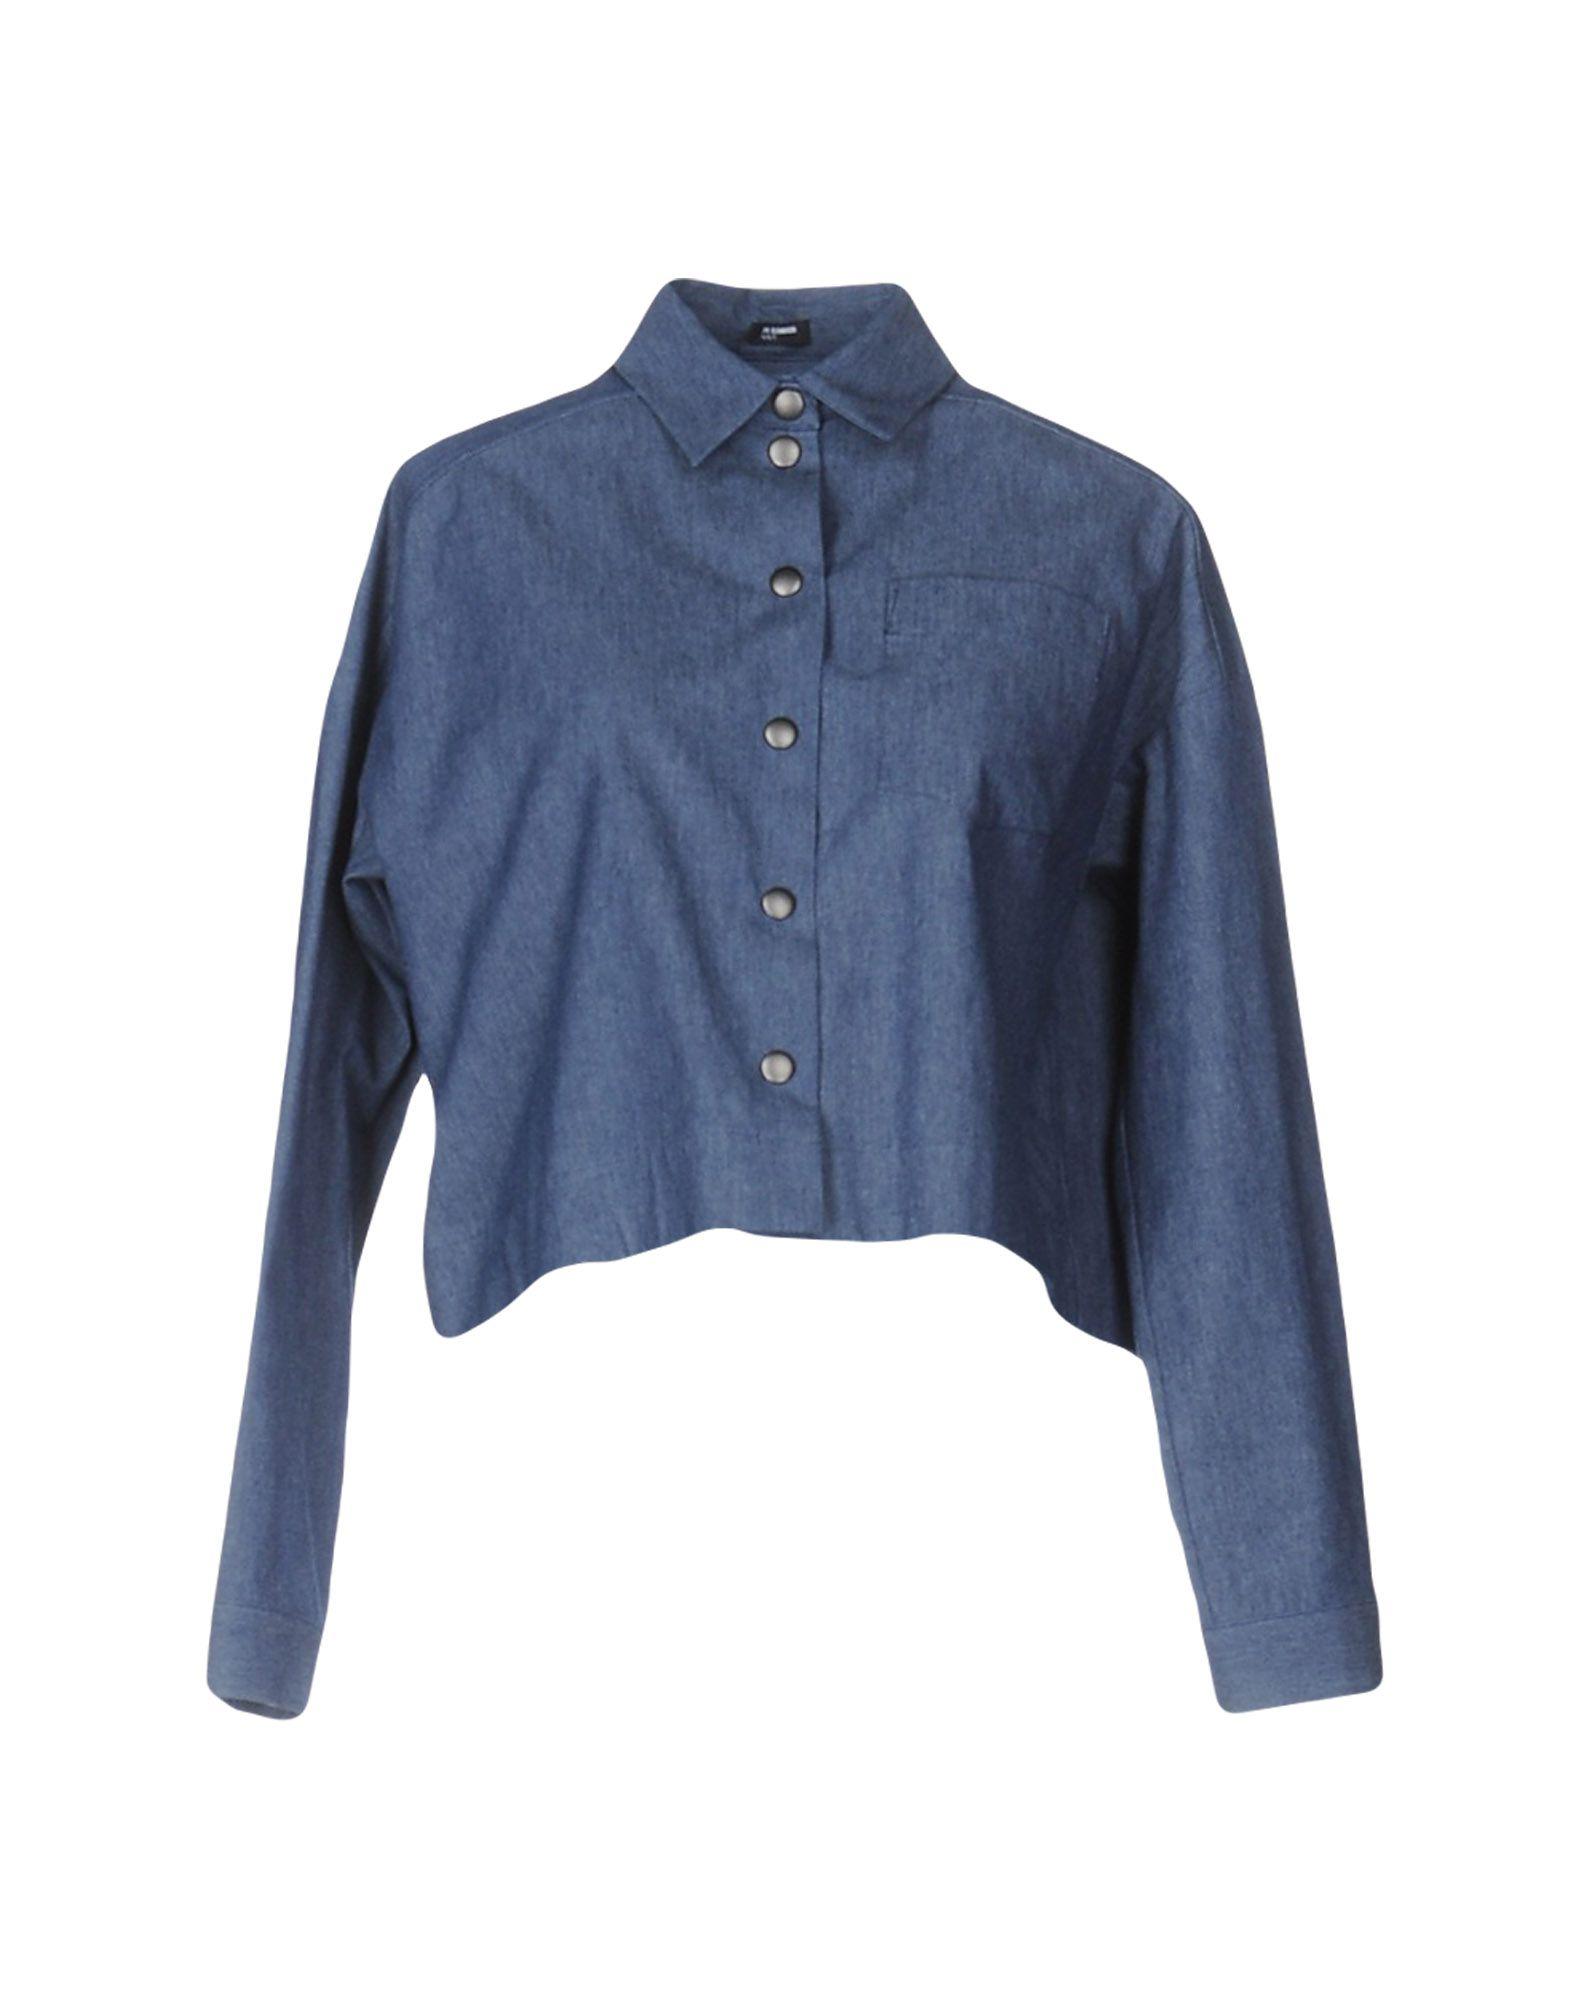 JIL SANDER NAVY Джинсовая рубашка